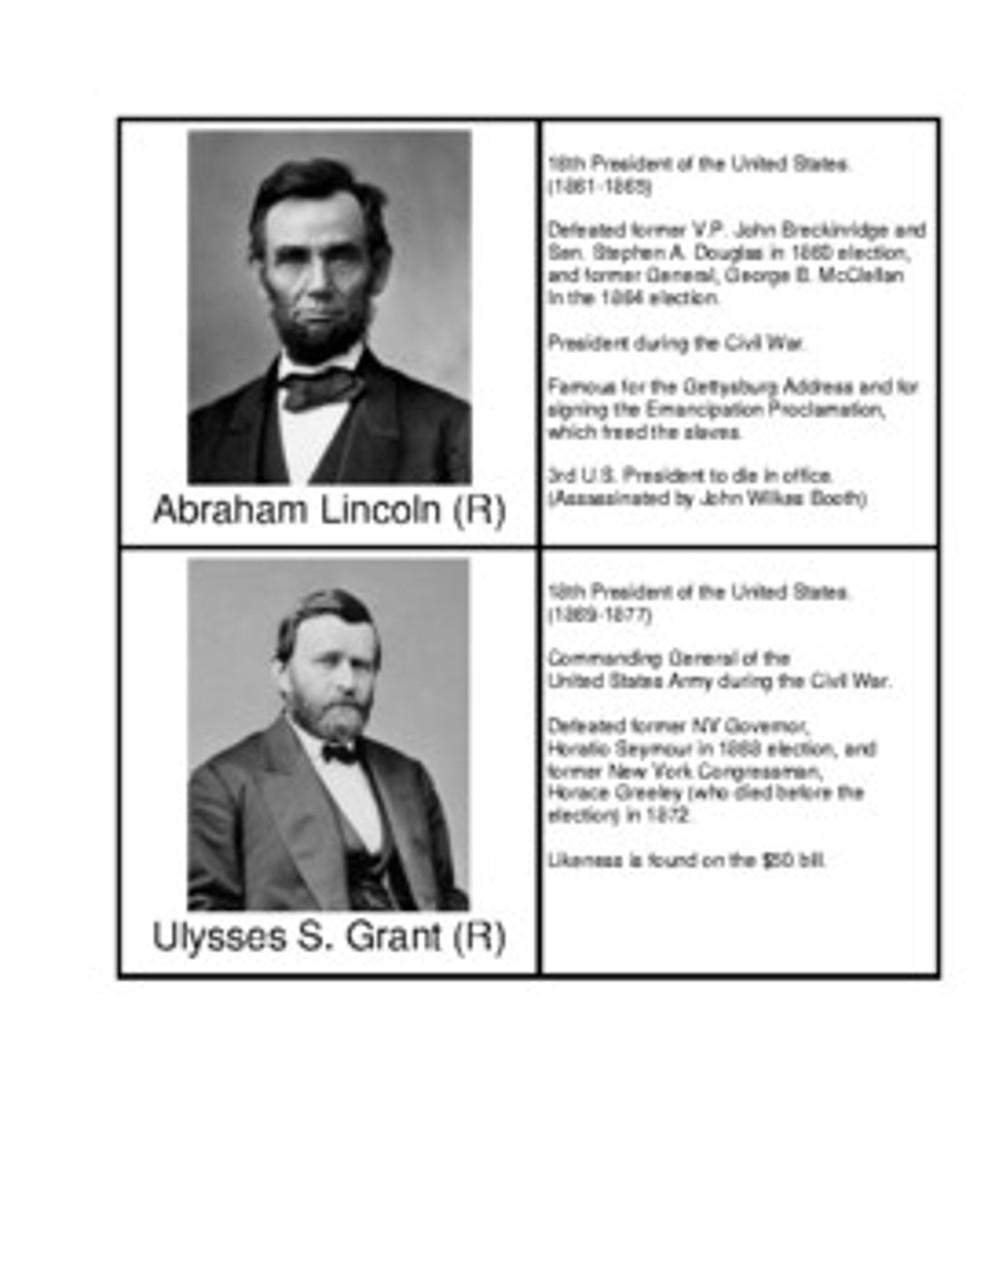 U.S. Presidents from Illinois